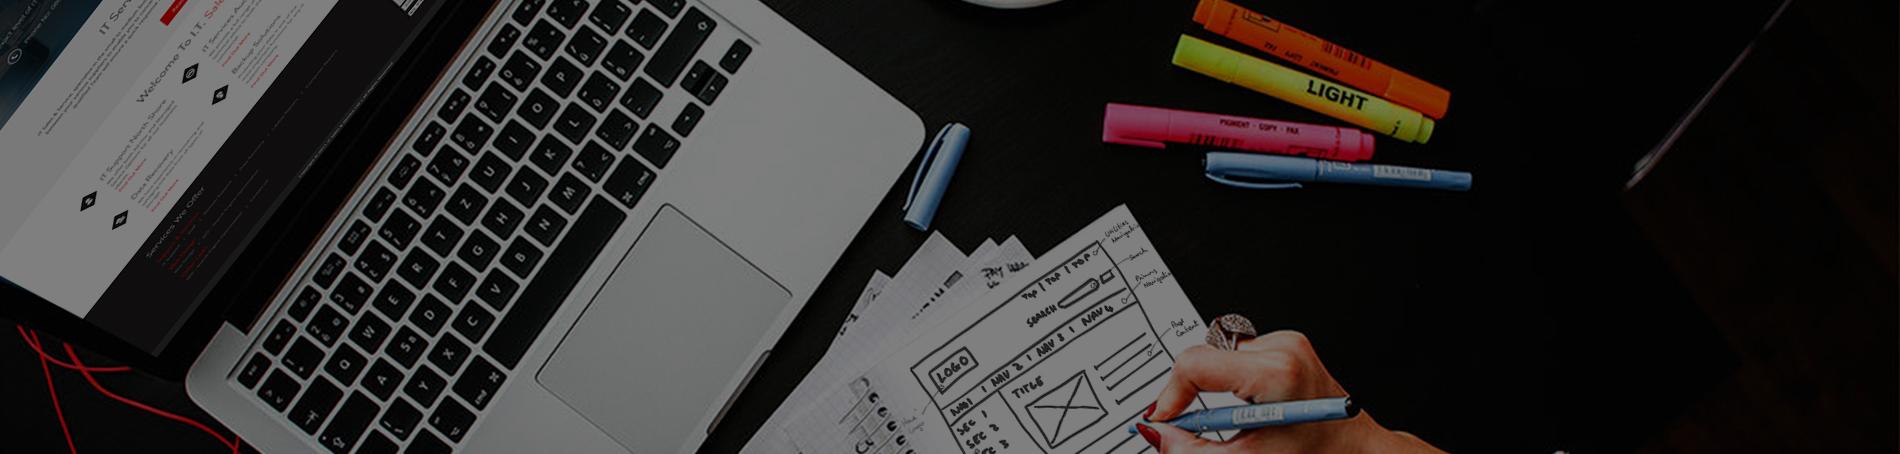 web design, website creator, webdesign north shore